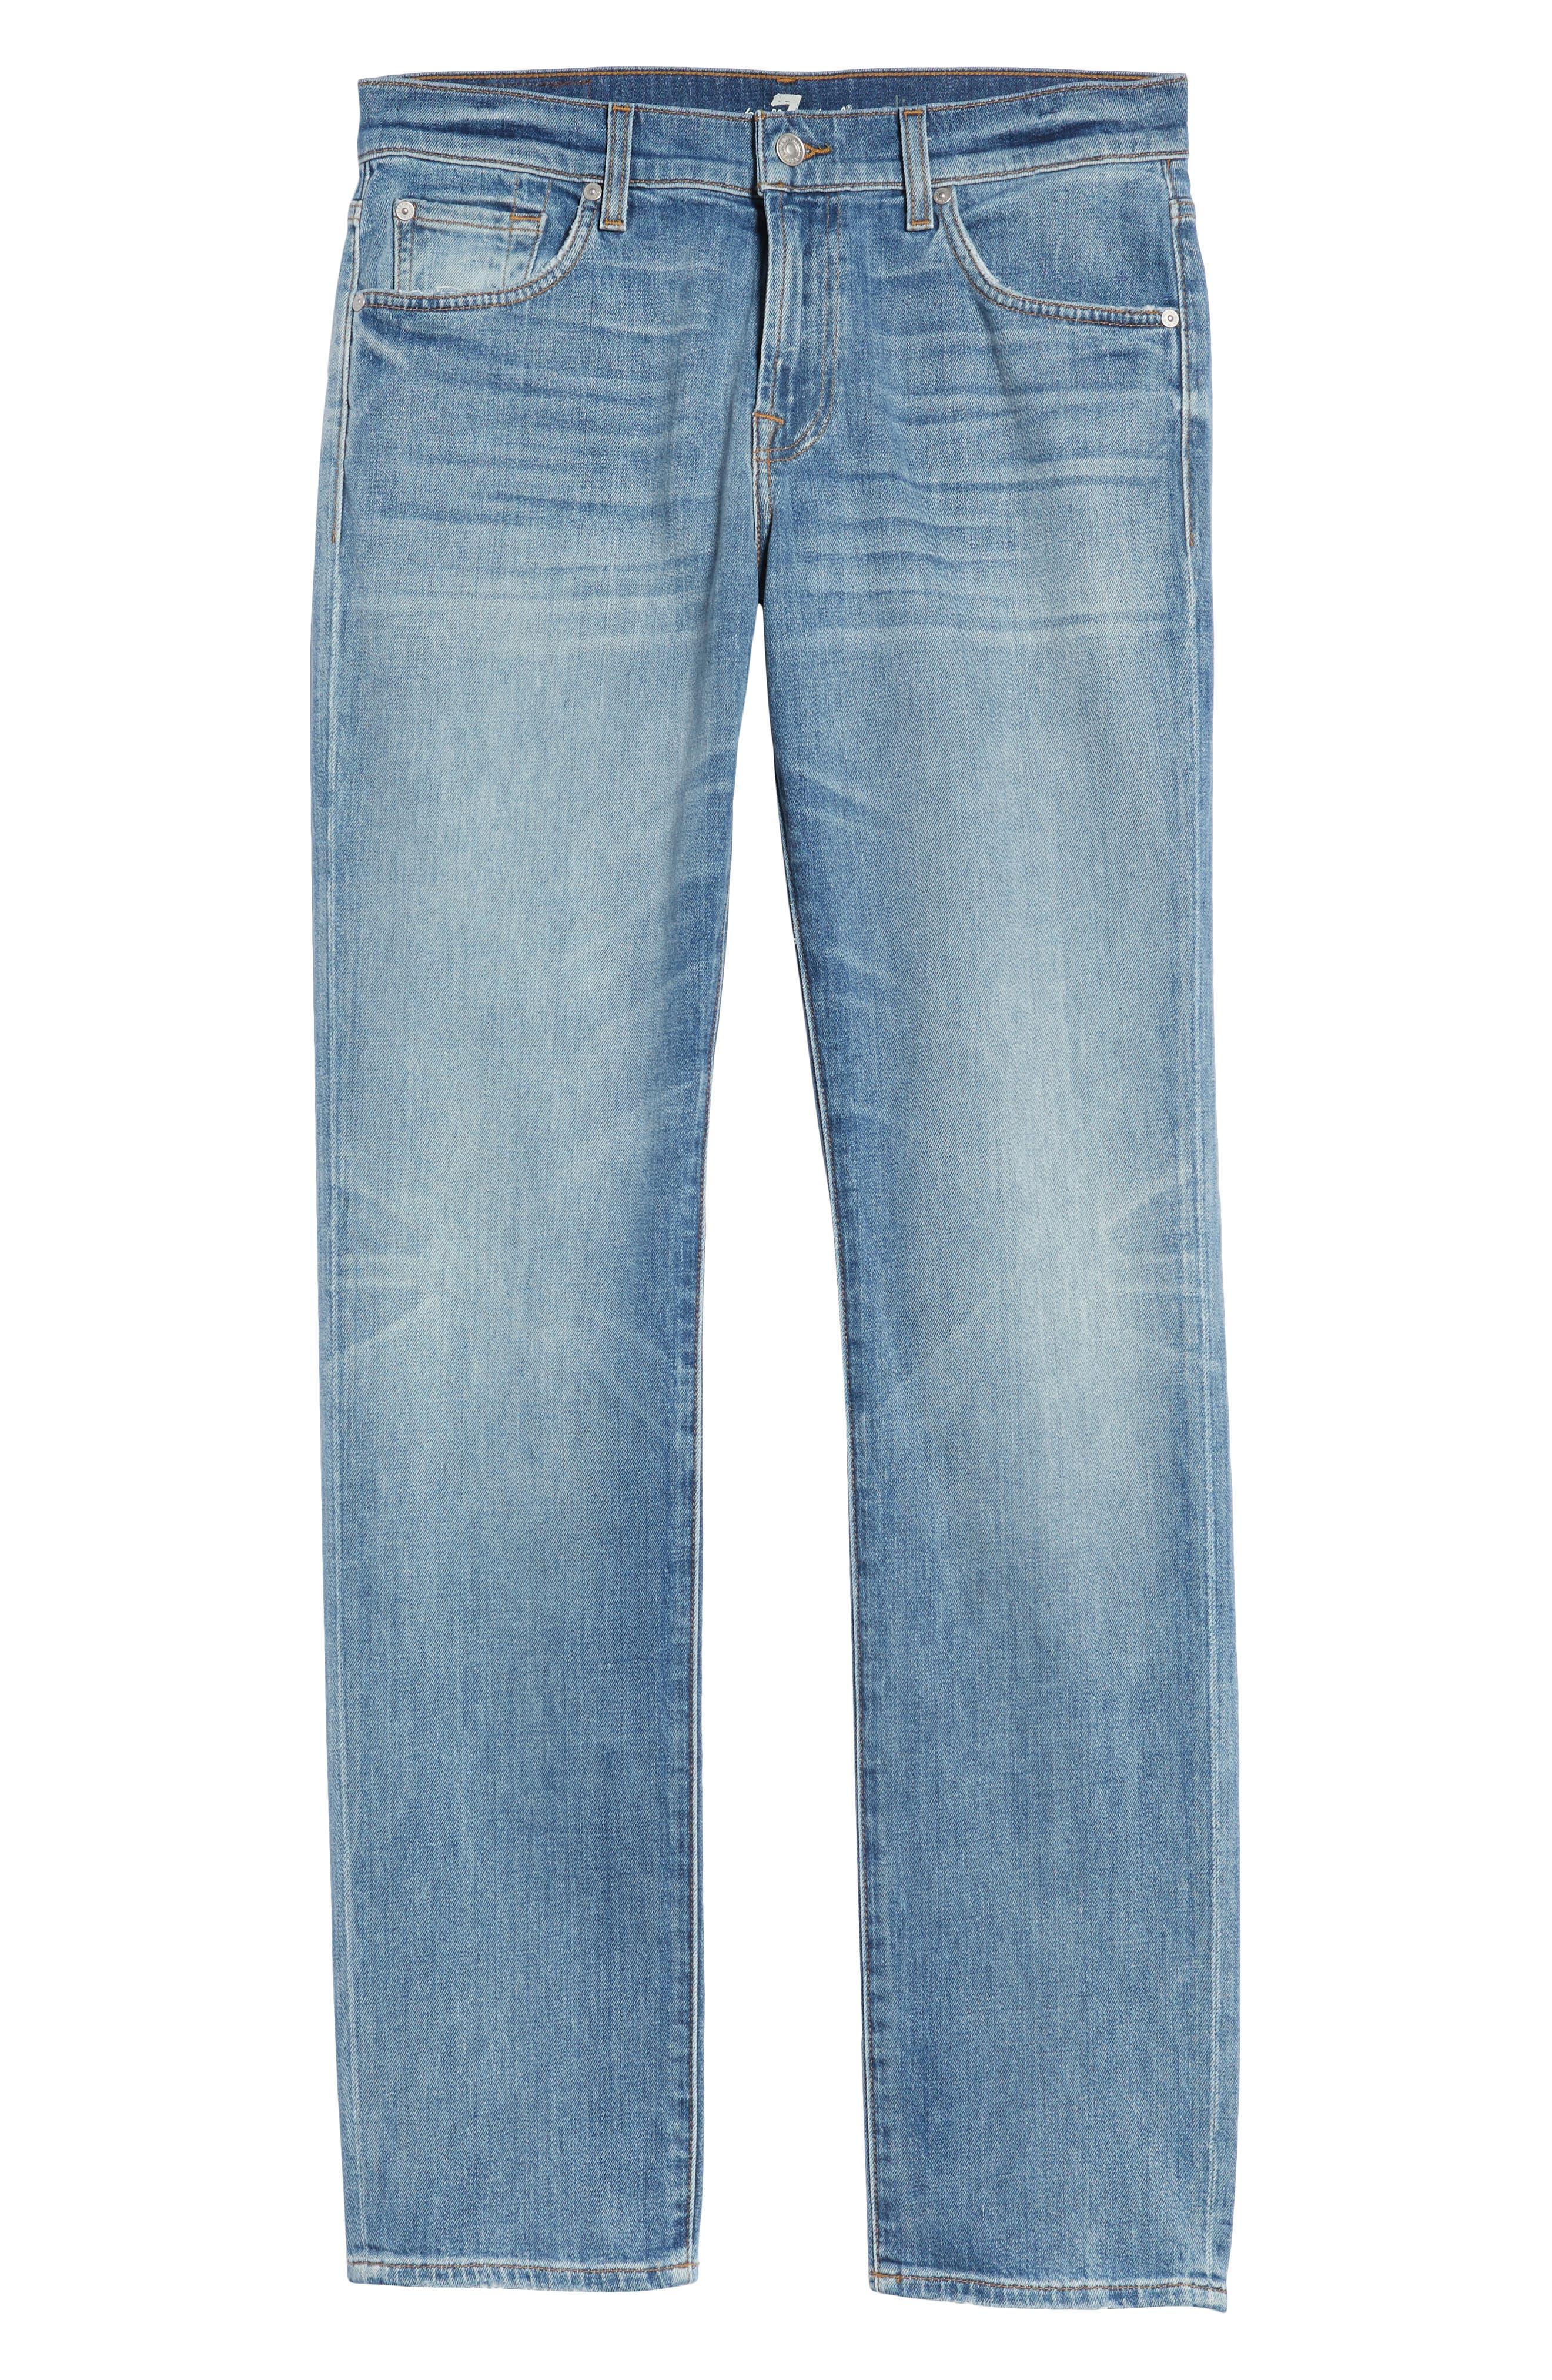 Slimmy Slim Fit Jeans,                             Alternate thumbnail 6, color,                             400